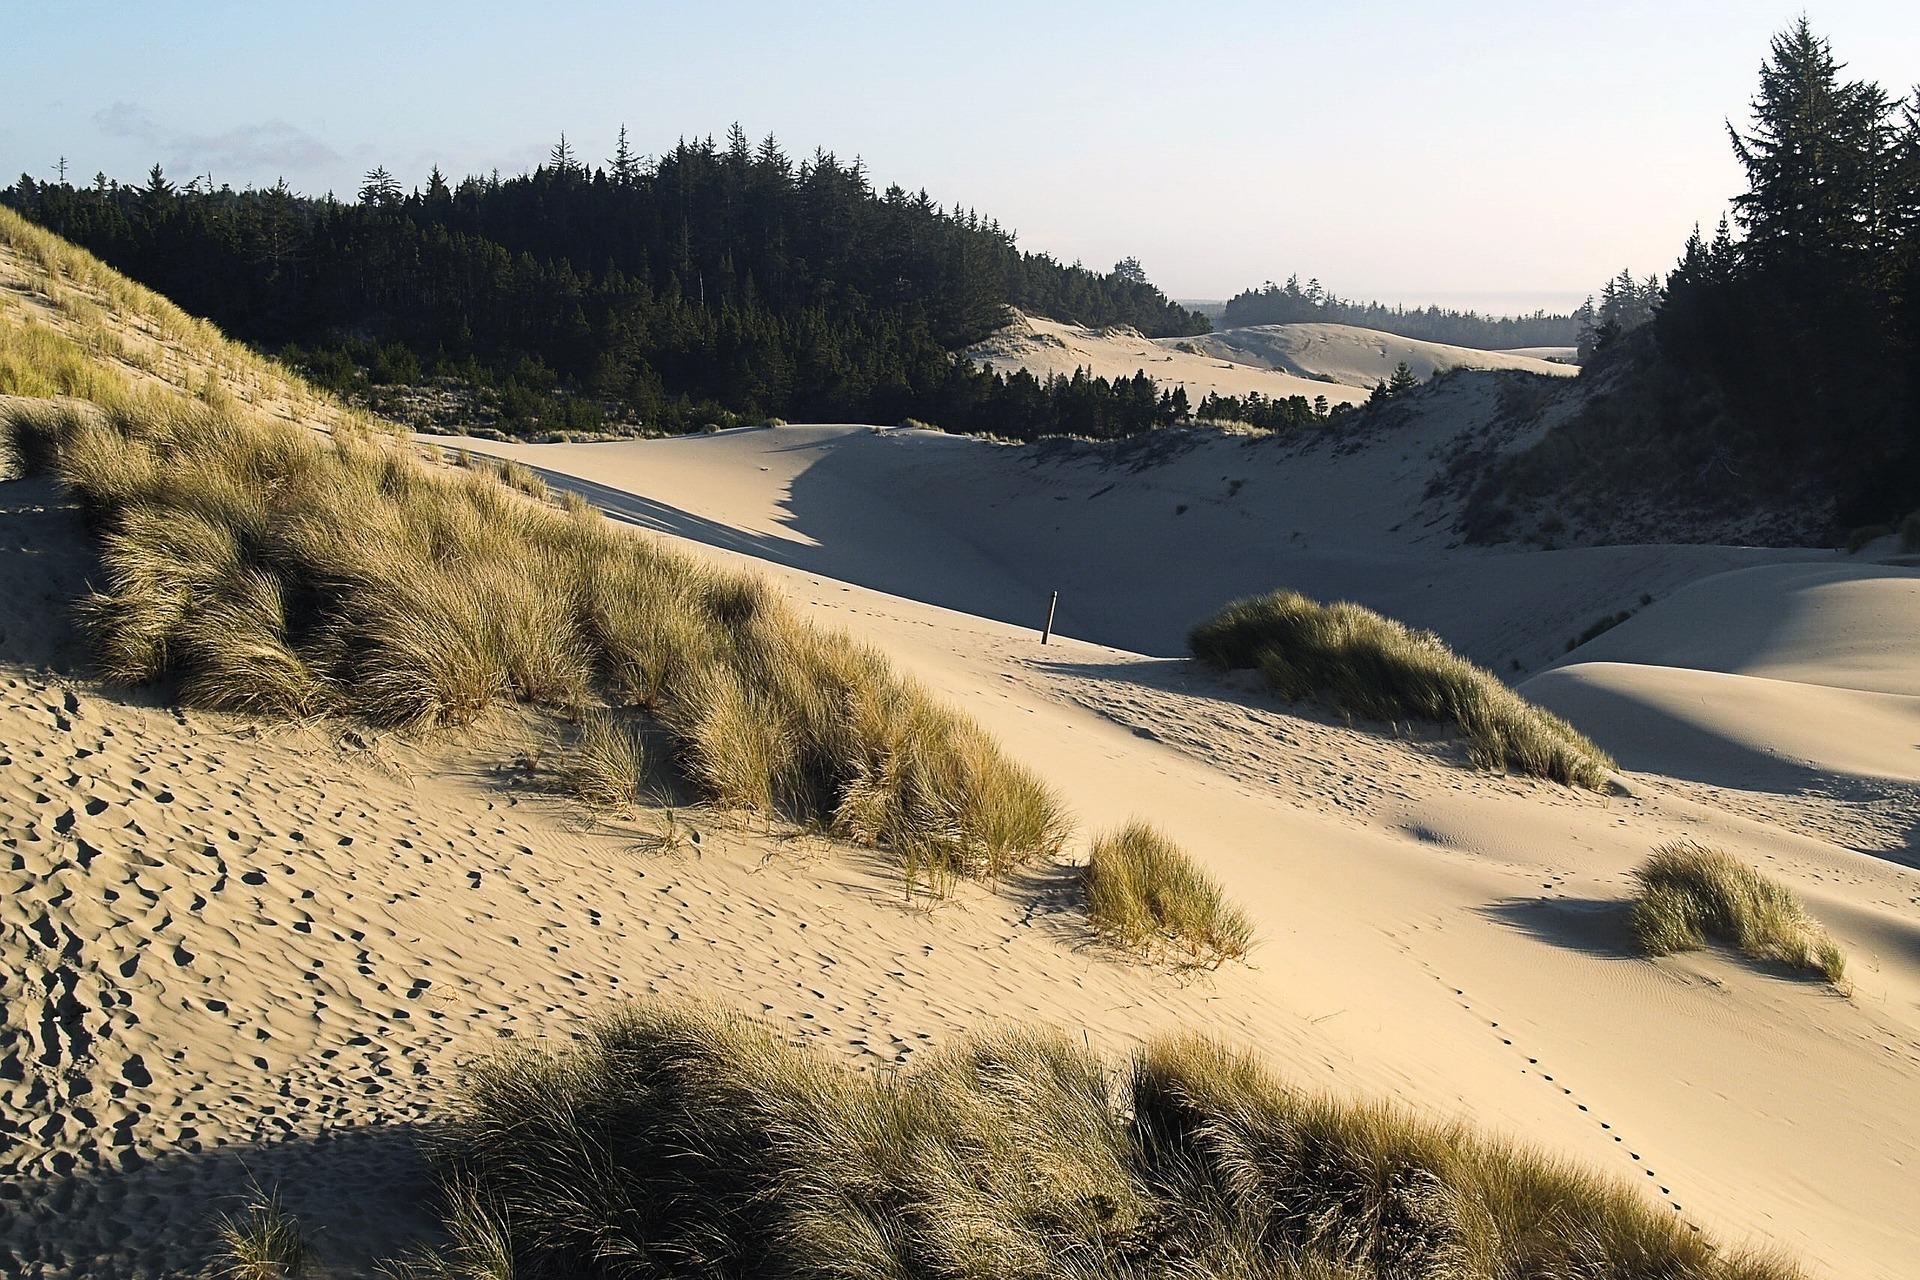 dunes-50068_1920